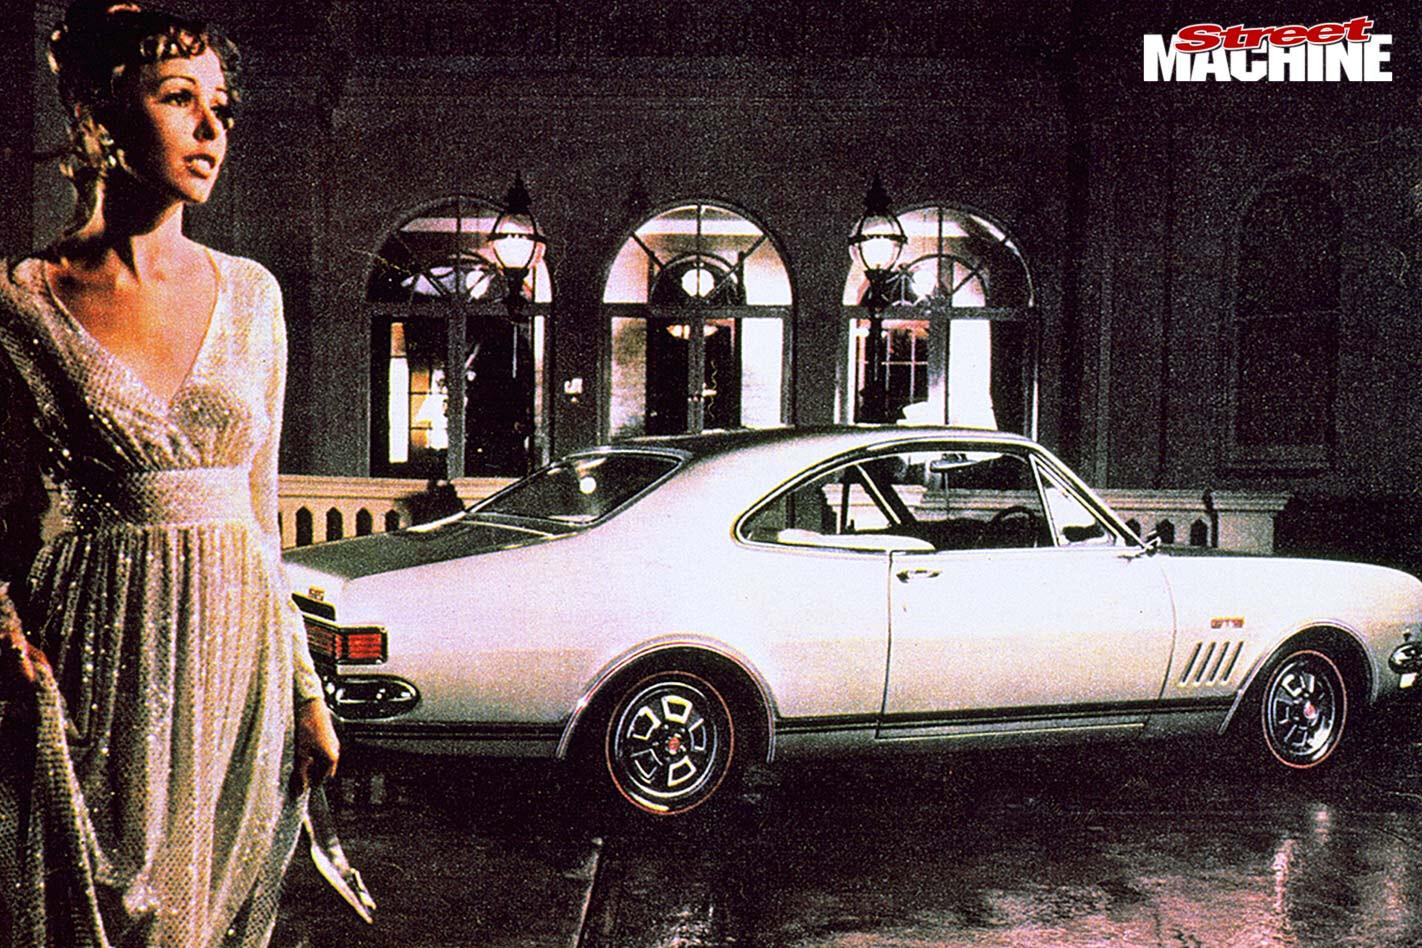 Holden Monaro HK GTS